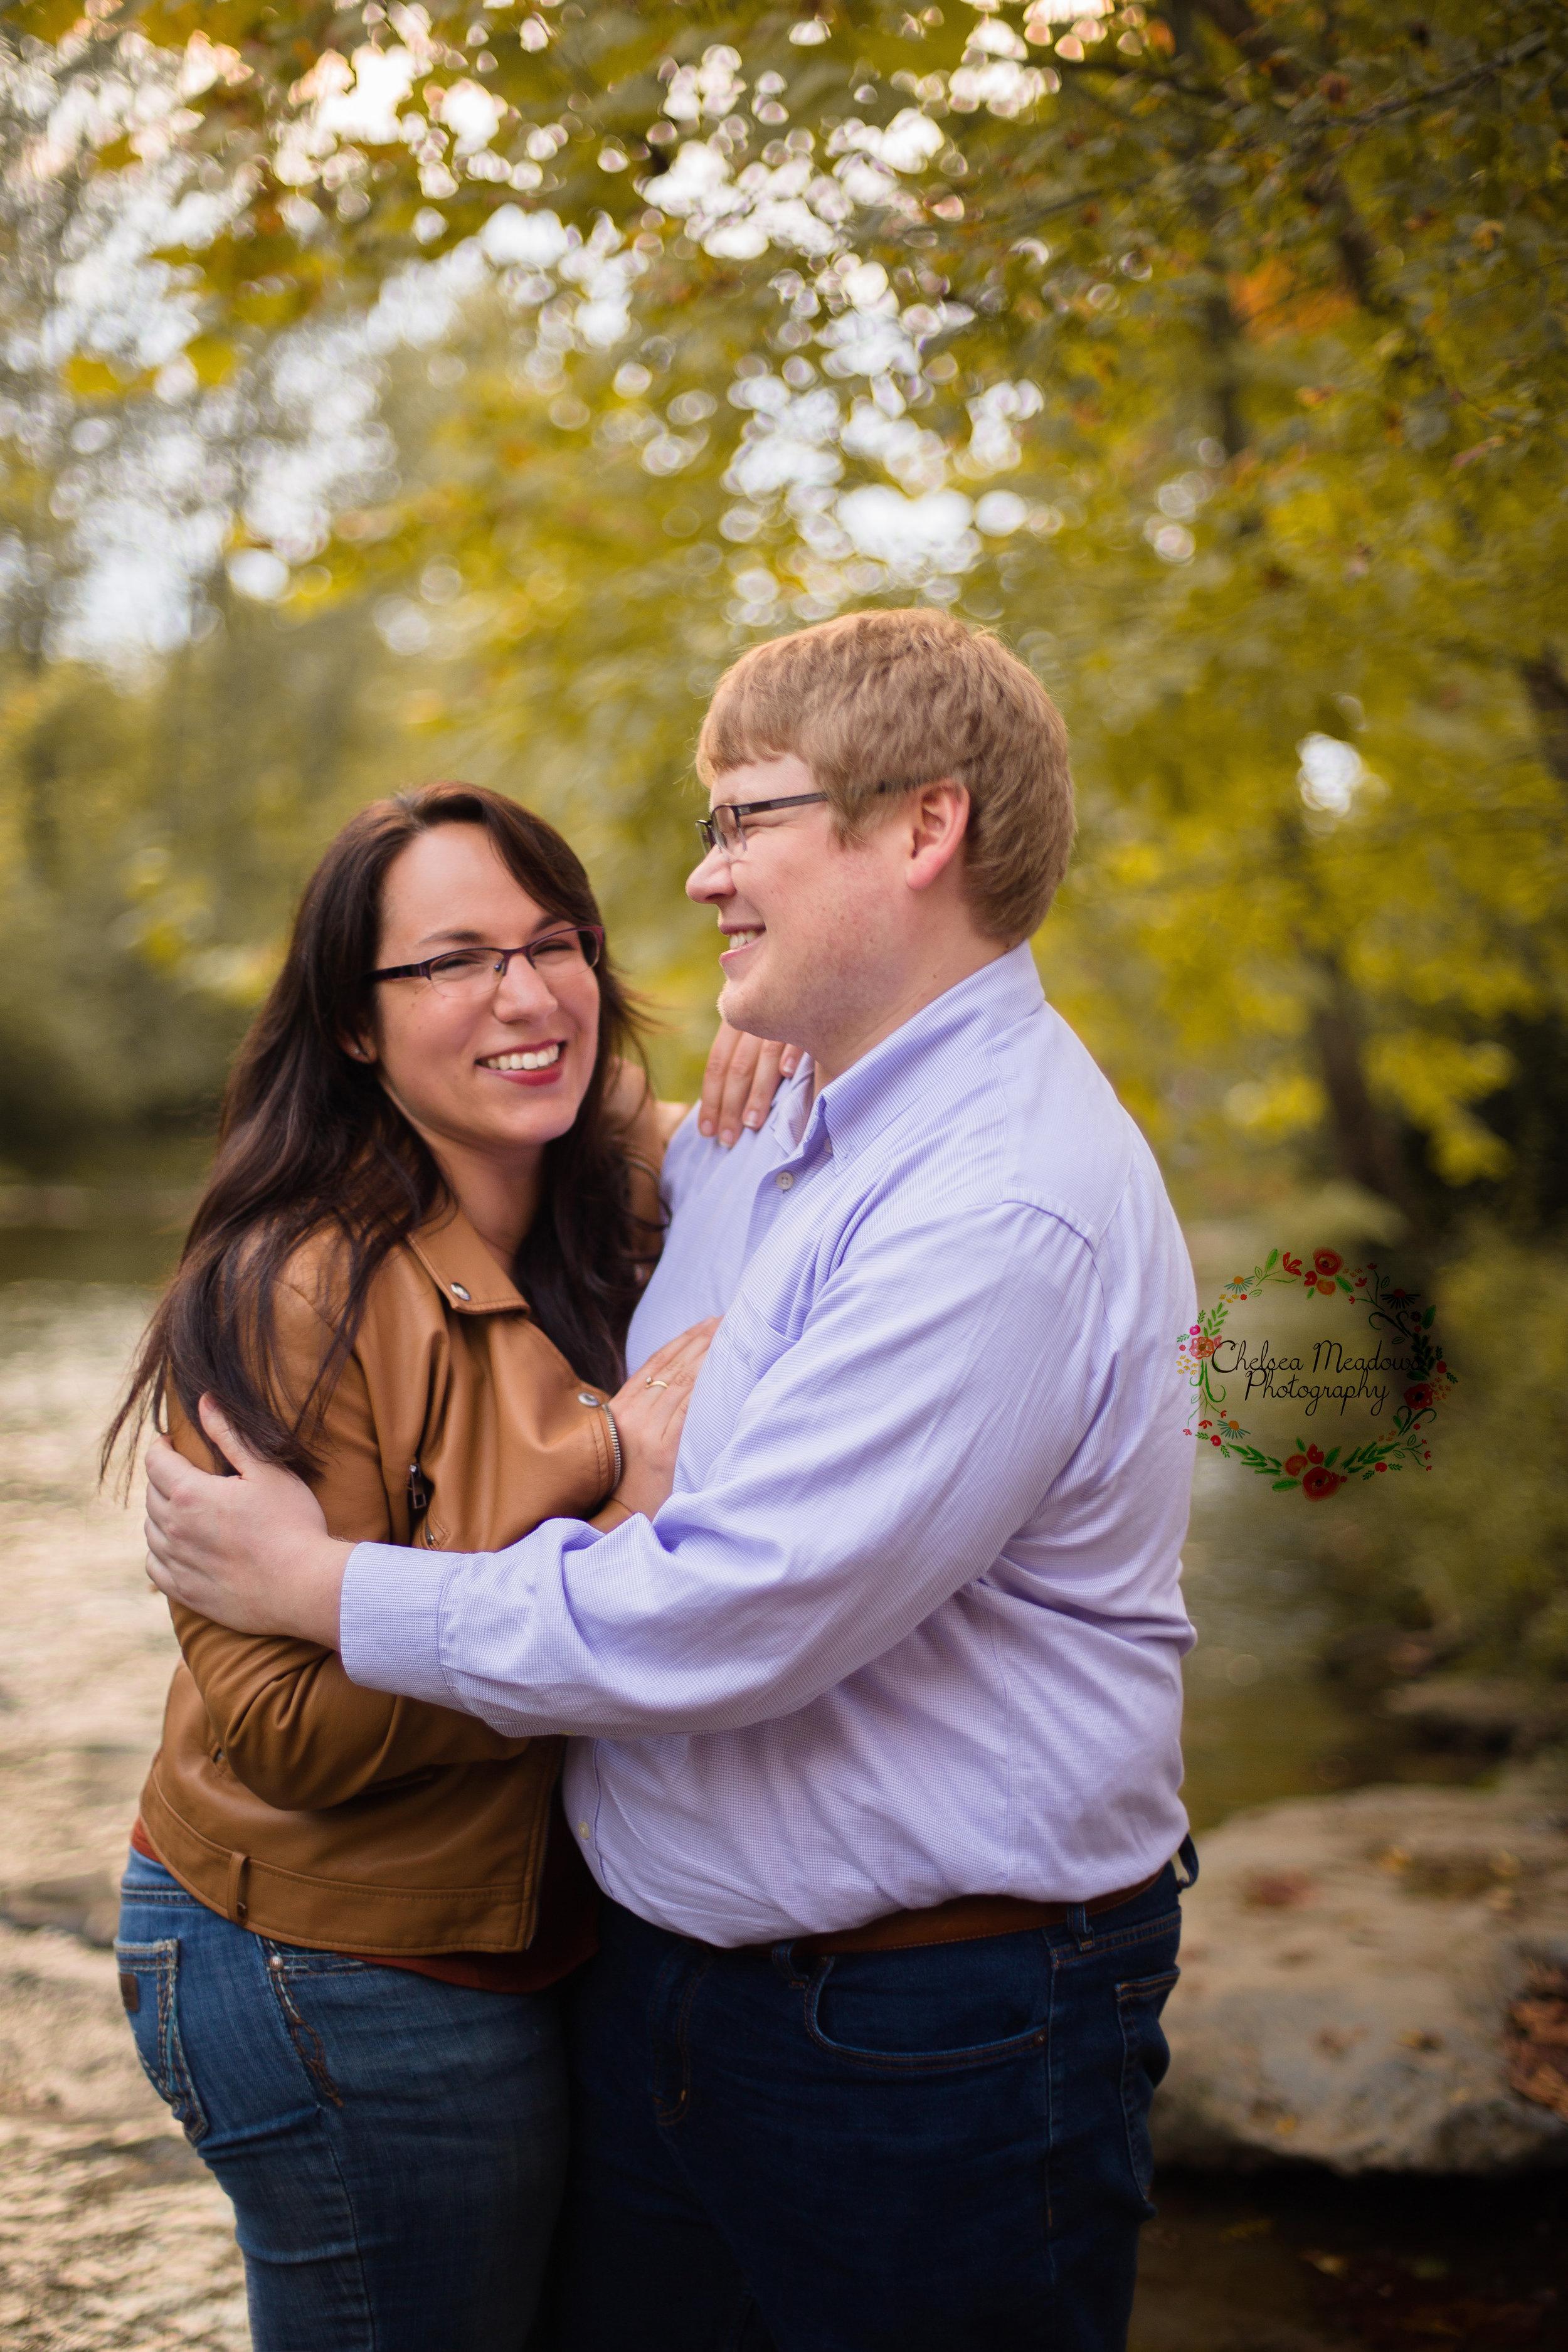 Ashley & Alex Engagement Session - Nashville Couple Photographer - Chelsea Meadows Photography (27).jpg